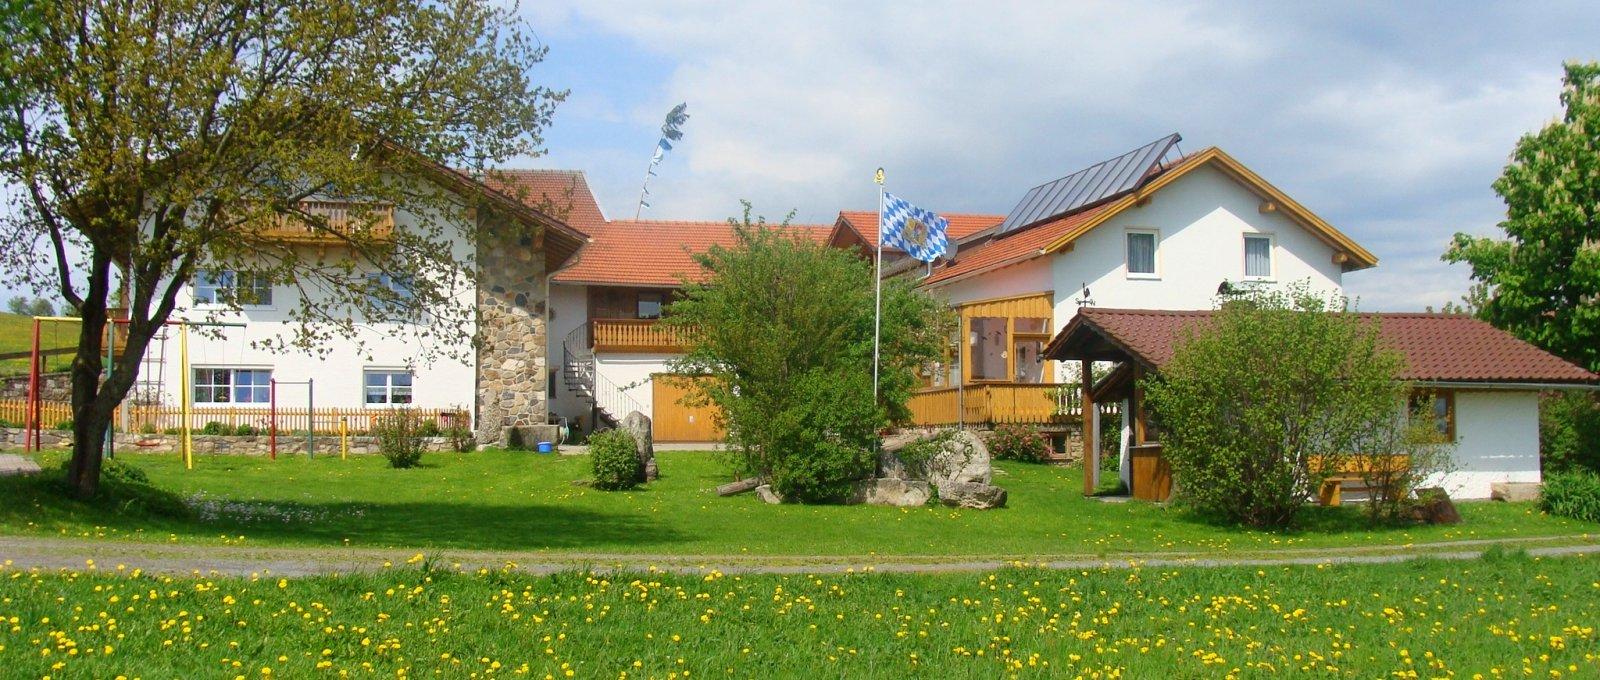 Ferienhof Bayerwaldblick in Kirchberg im Wald